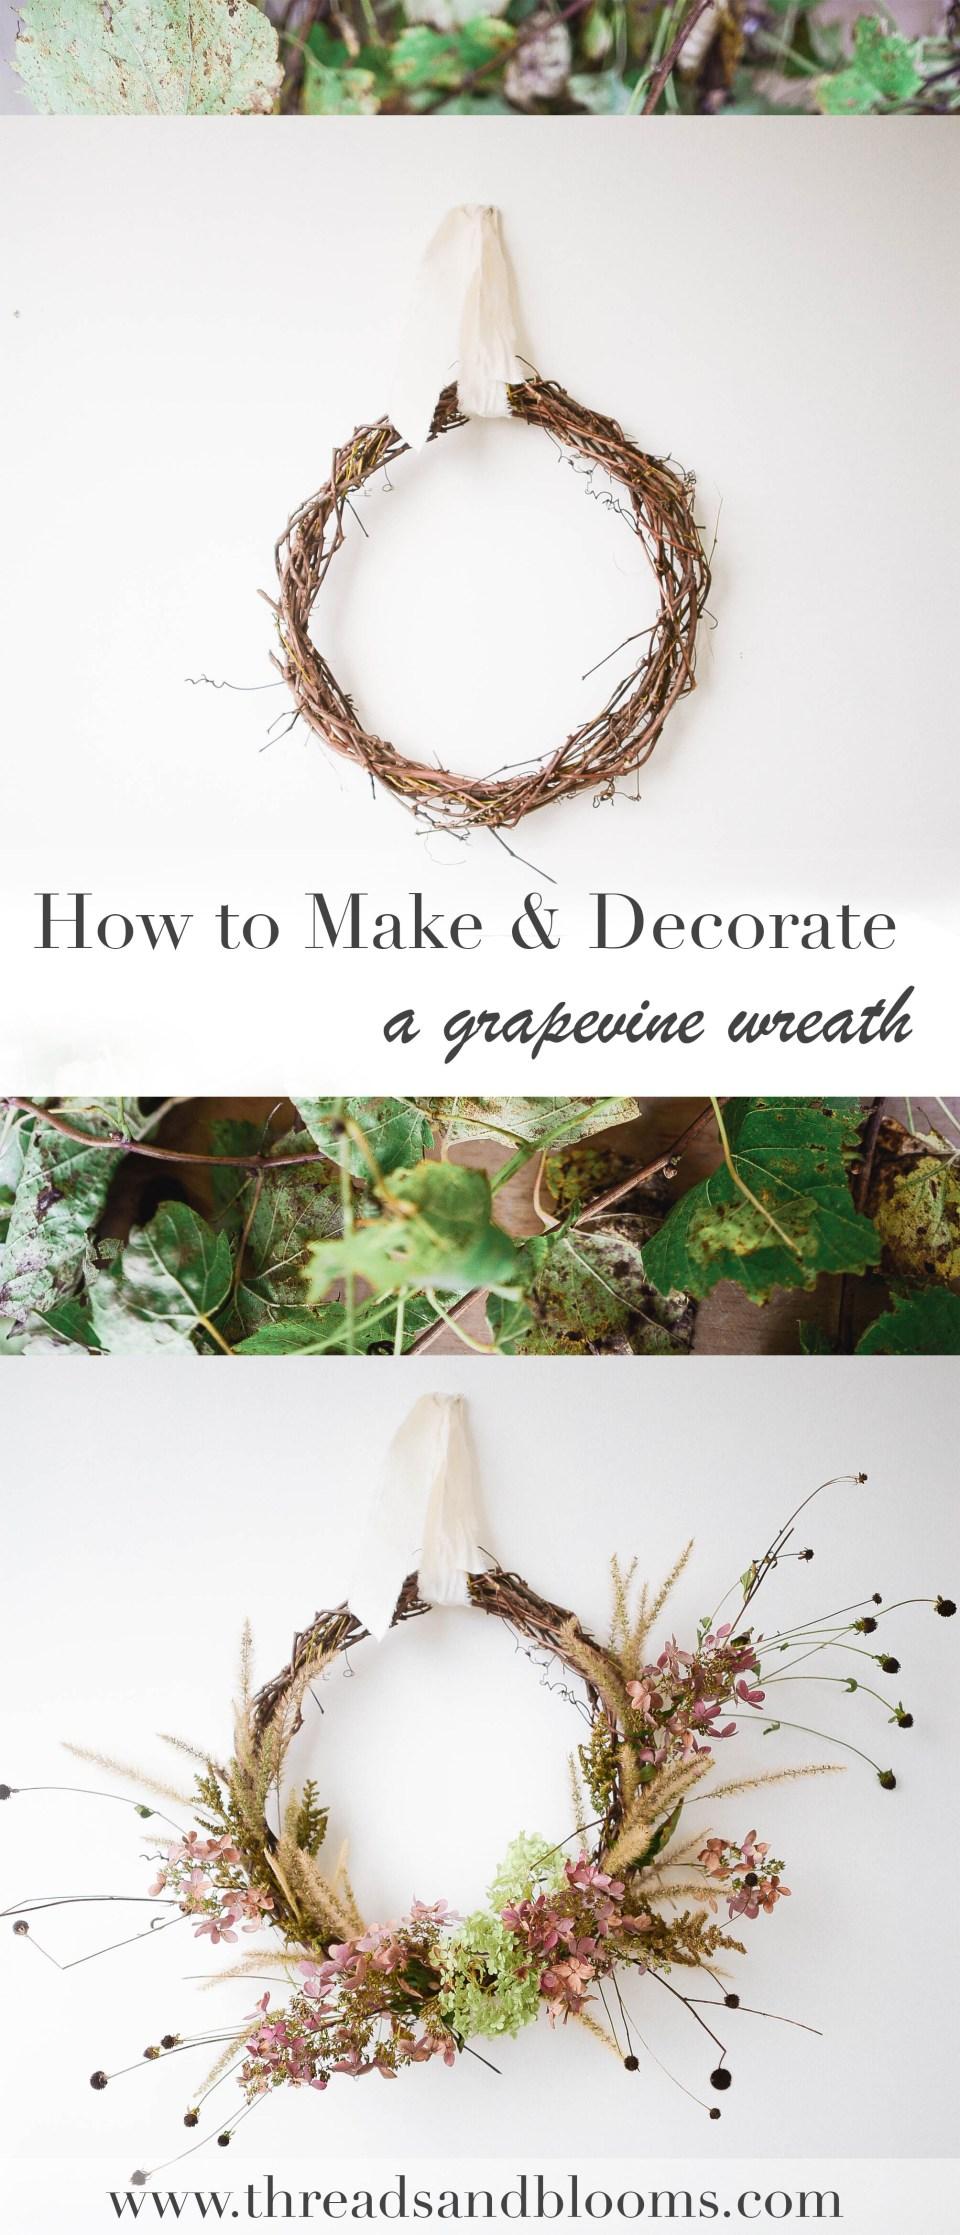 How to Make a Wreath - Fall DIY